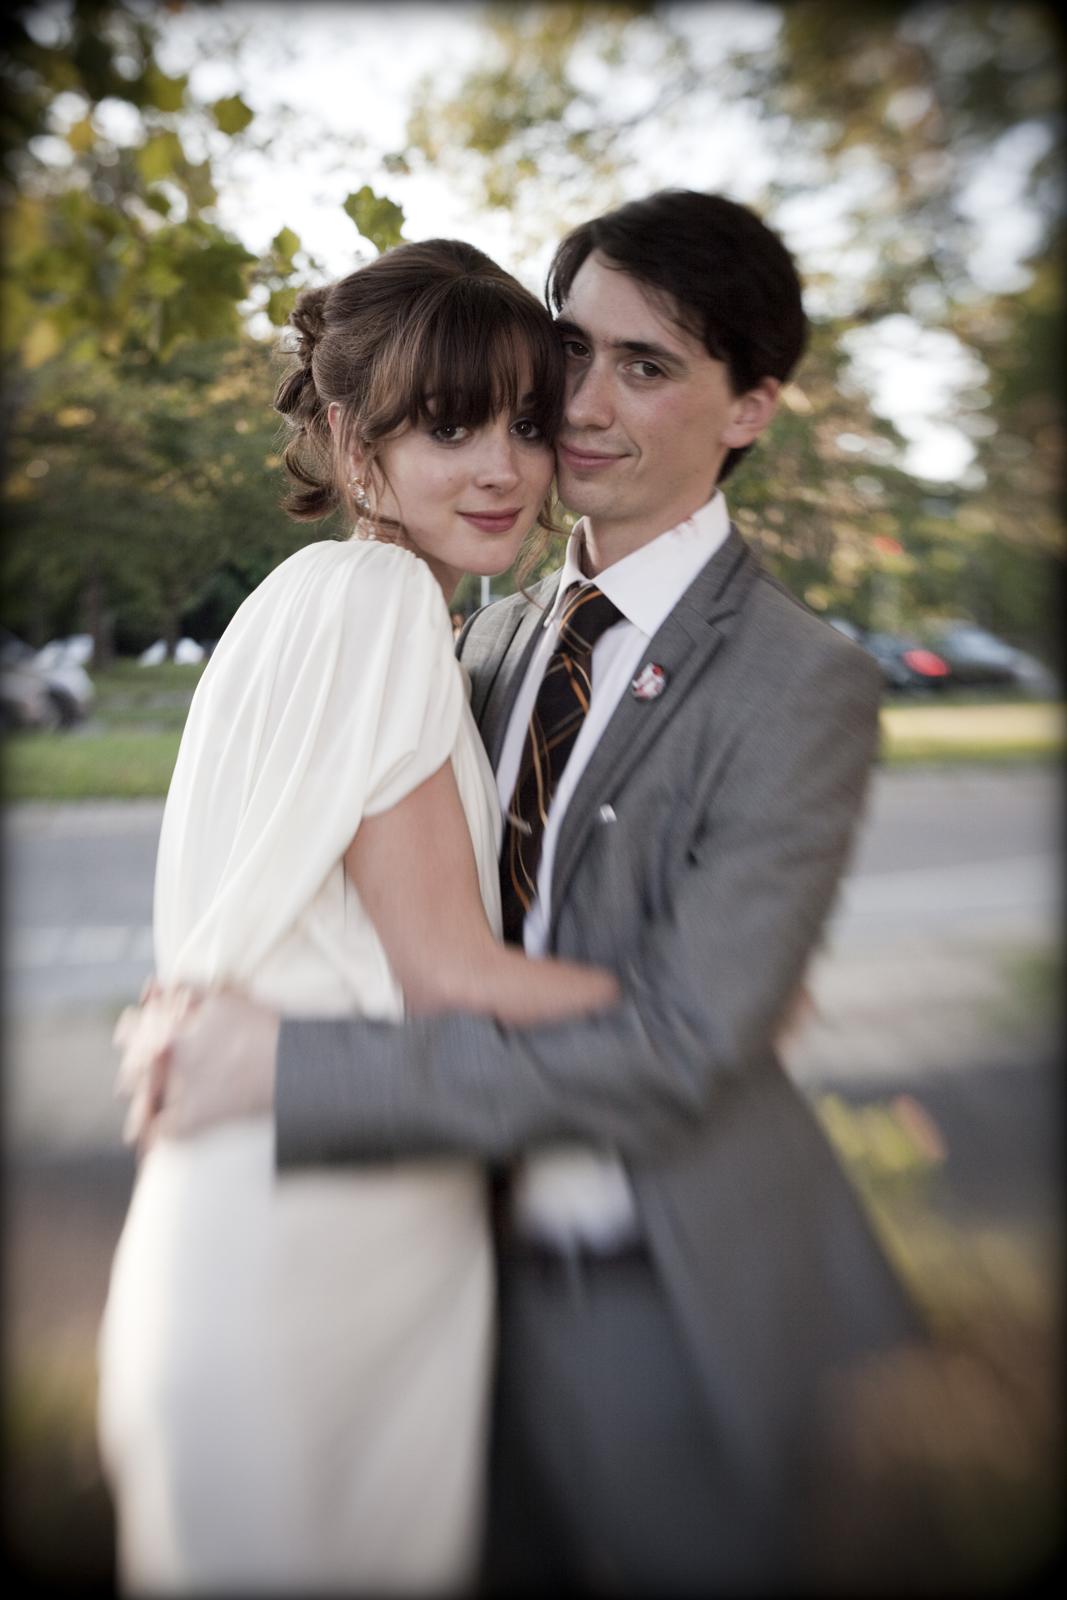 Dar's Weddings